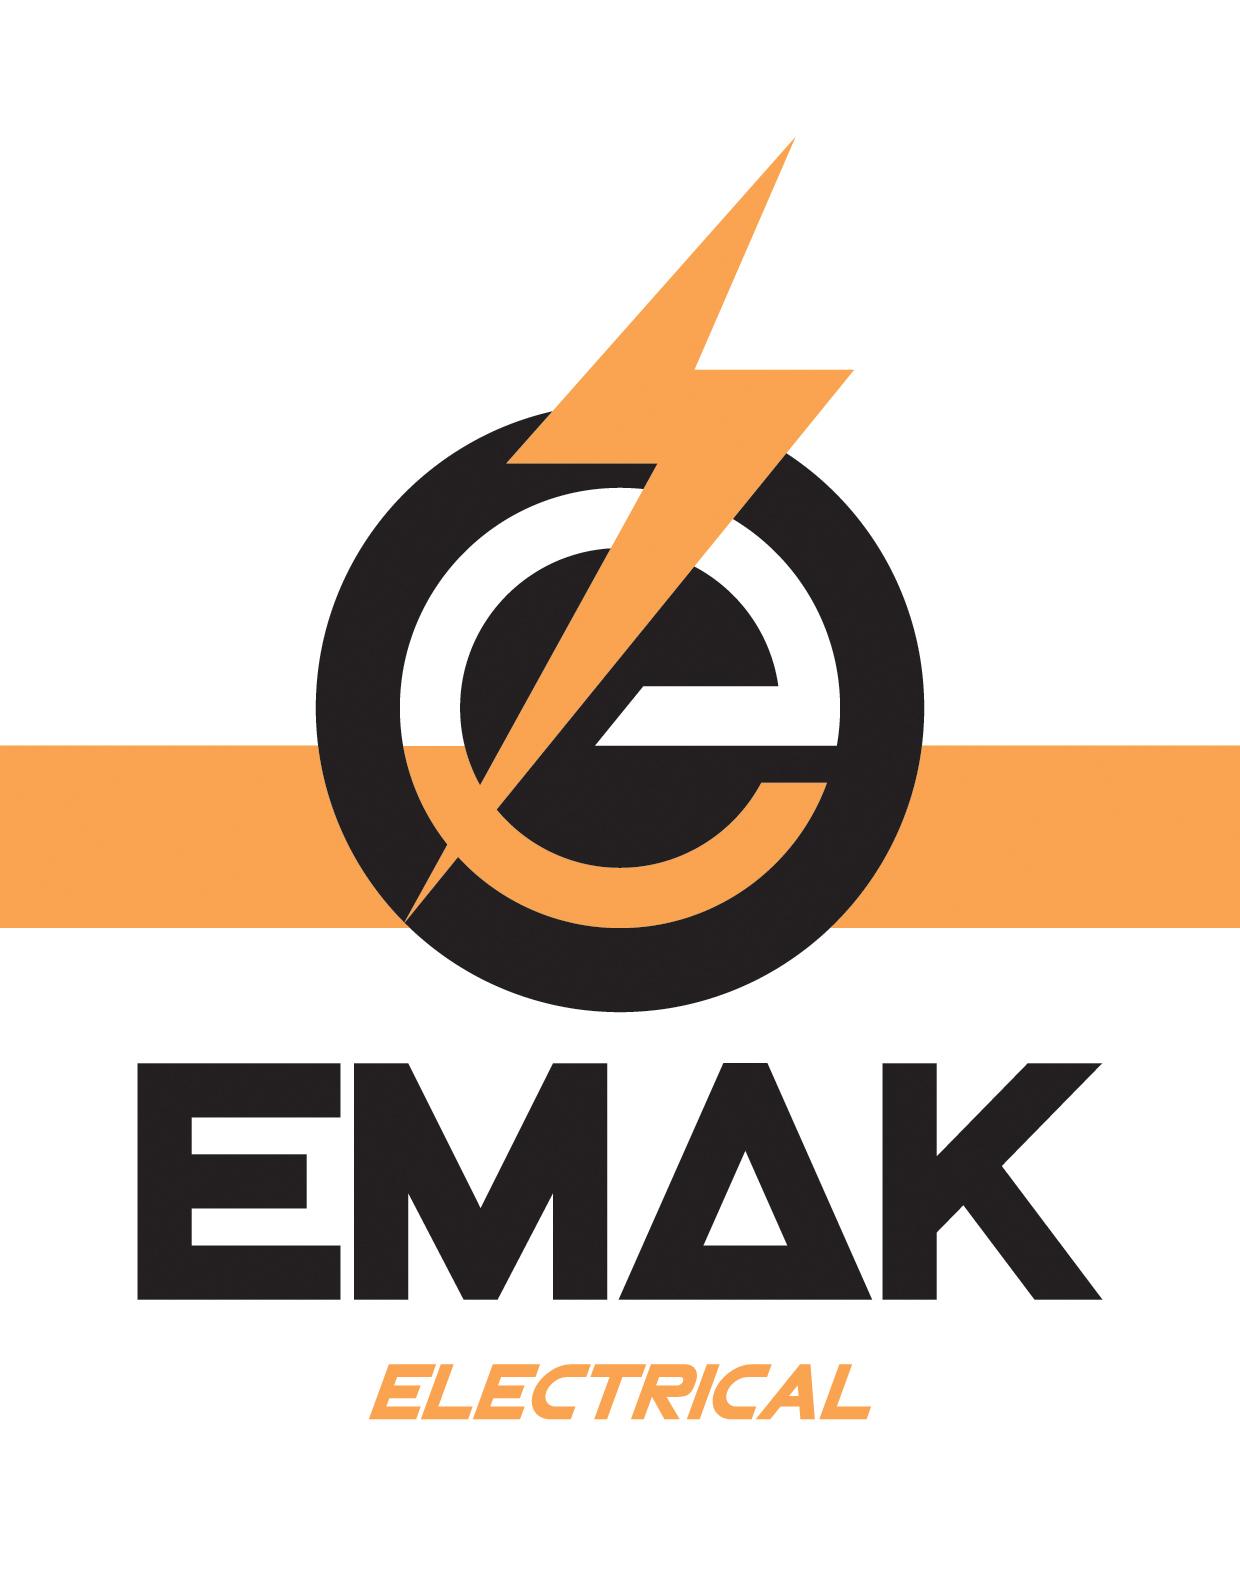 EMAK_LOGO_stacked_orange_web.jpg